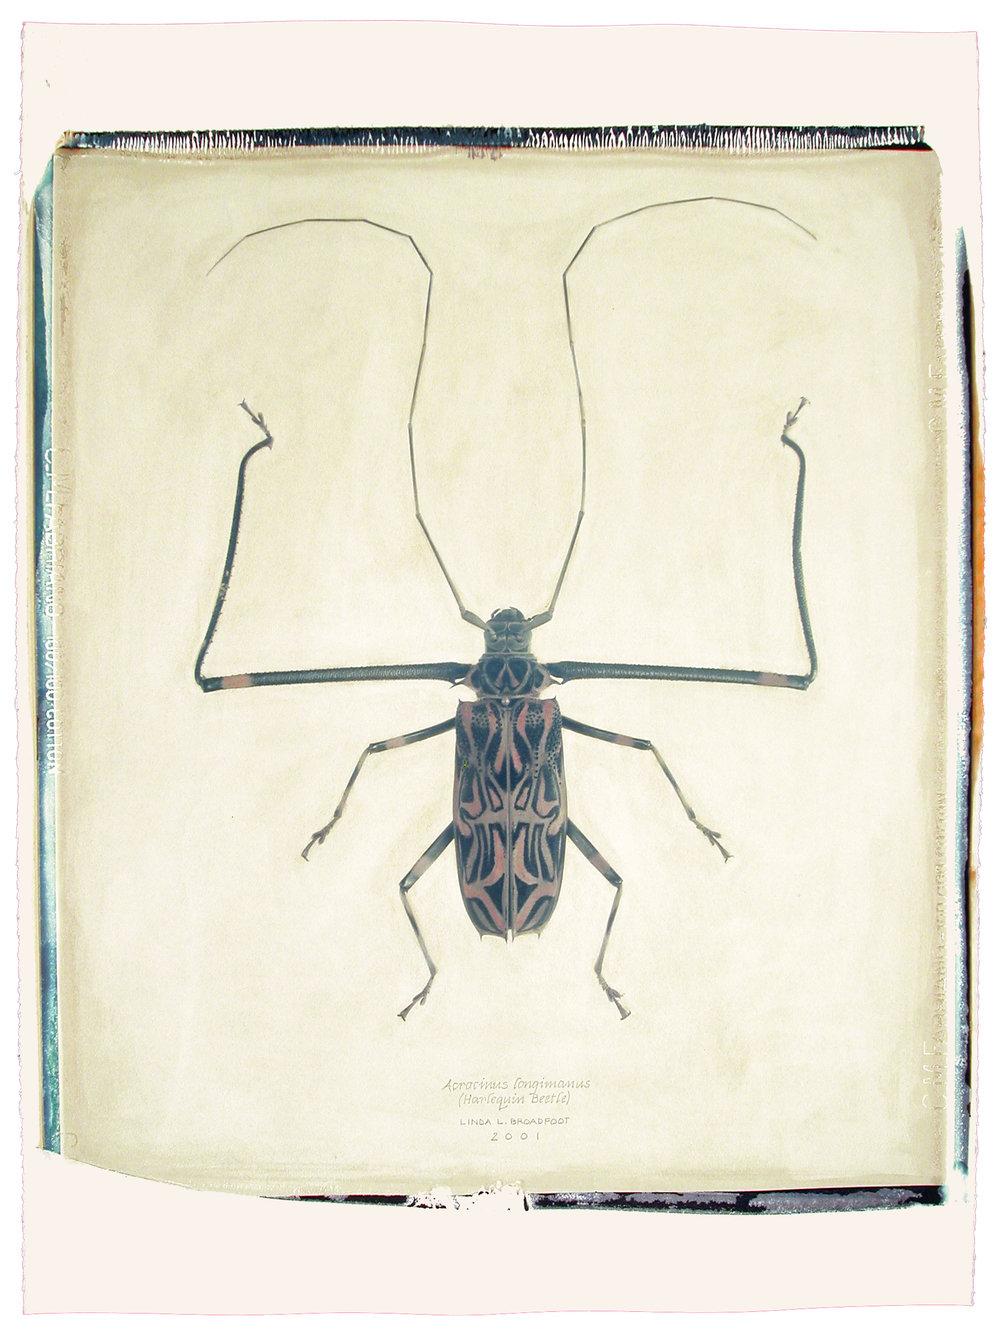 Acrocinius longimanus  (Harlequin Beetle), 2001